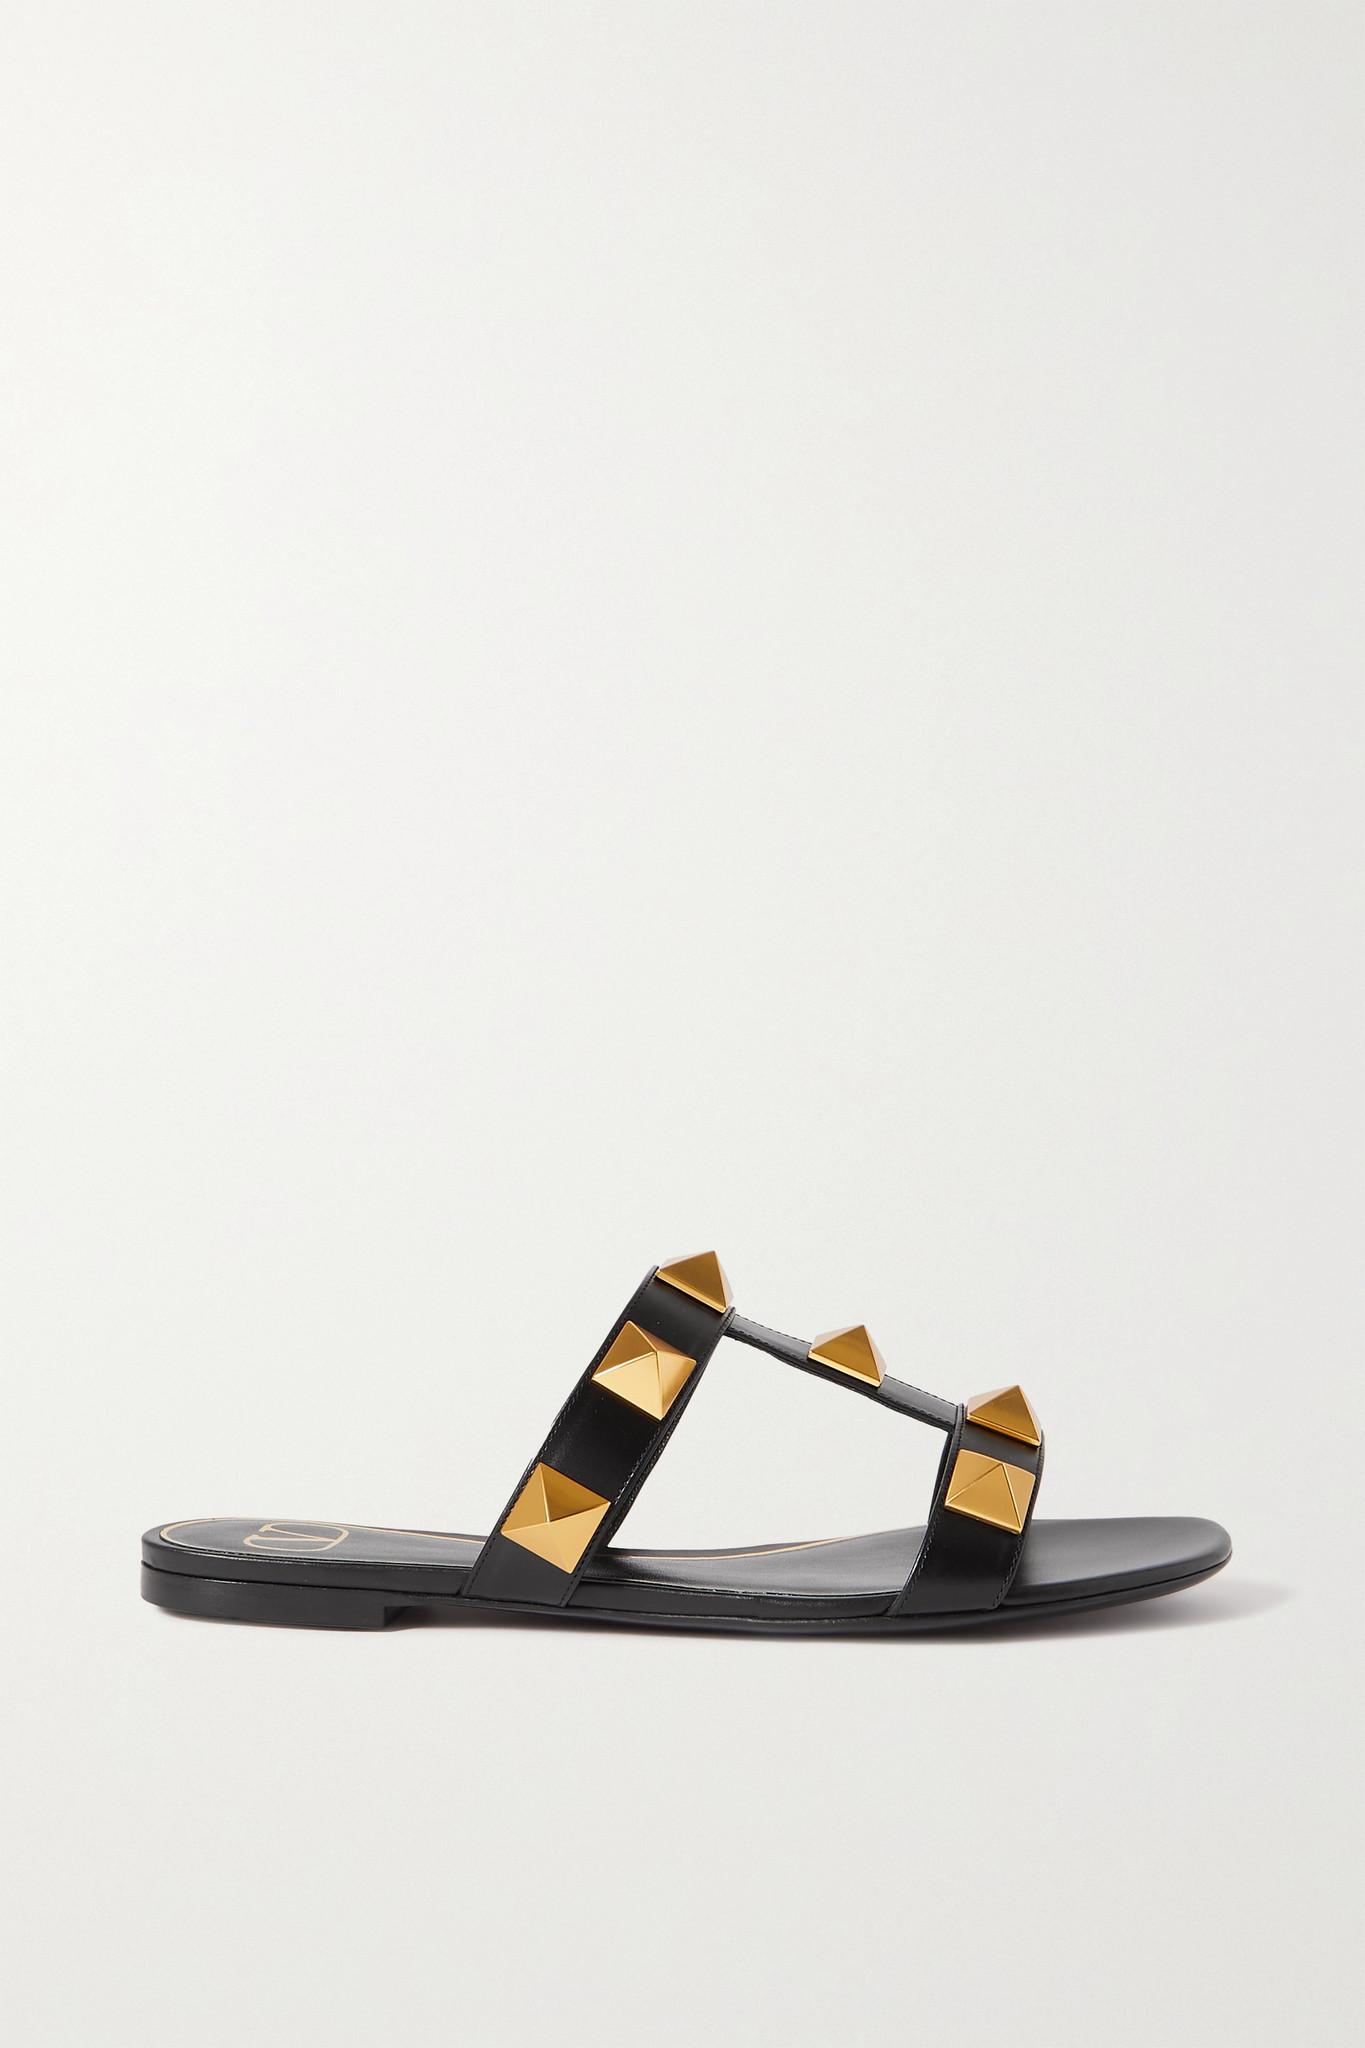 VALENTINO - Valentino Garavani Roman Stud Leather Sandals - Black - IT39